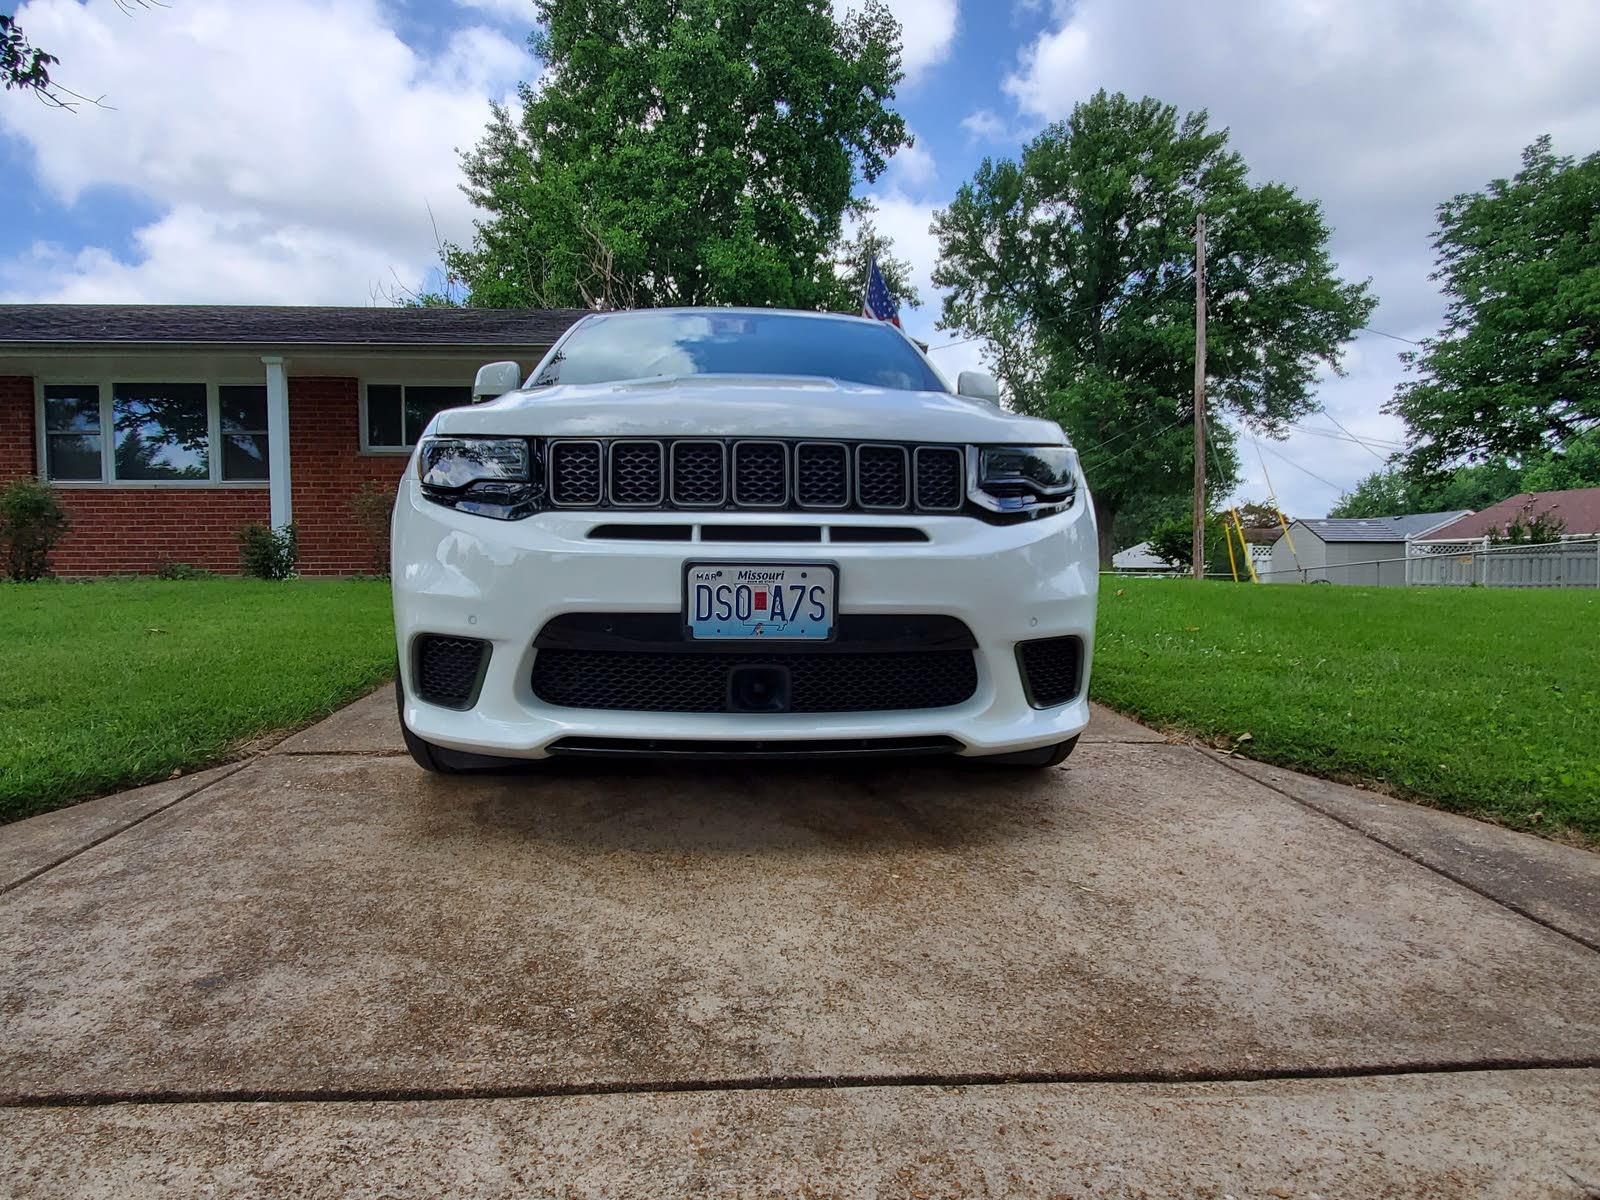 2018 Jeep Grand Cherokee Trackhawk 4wd For Sale In Las Vegas Nv Cargurus